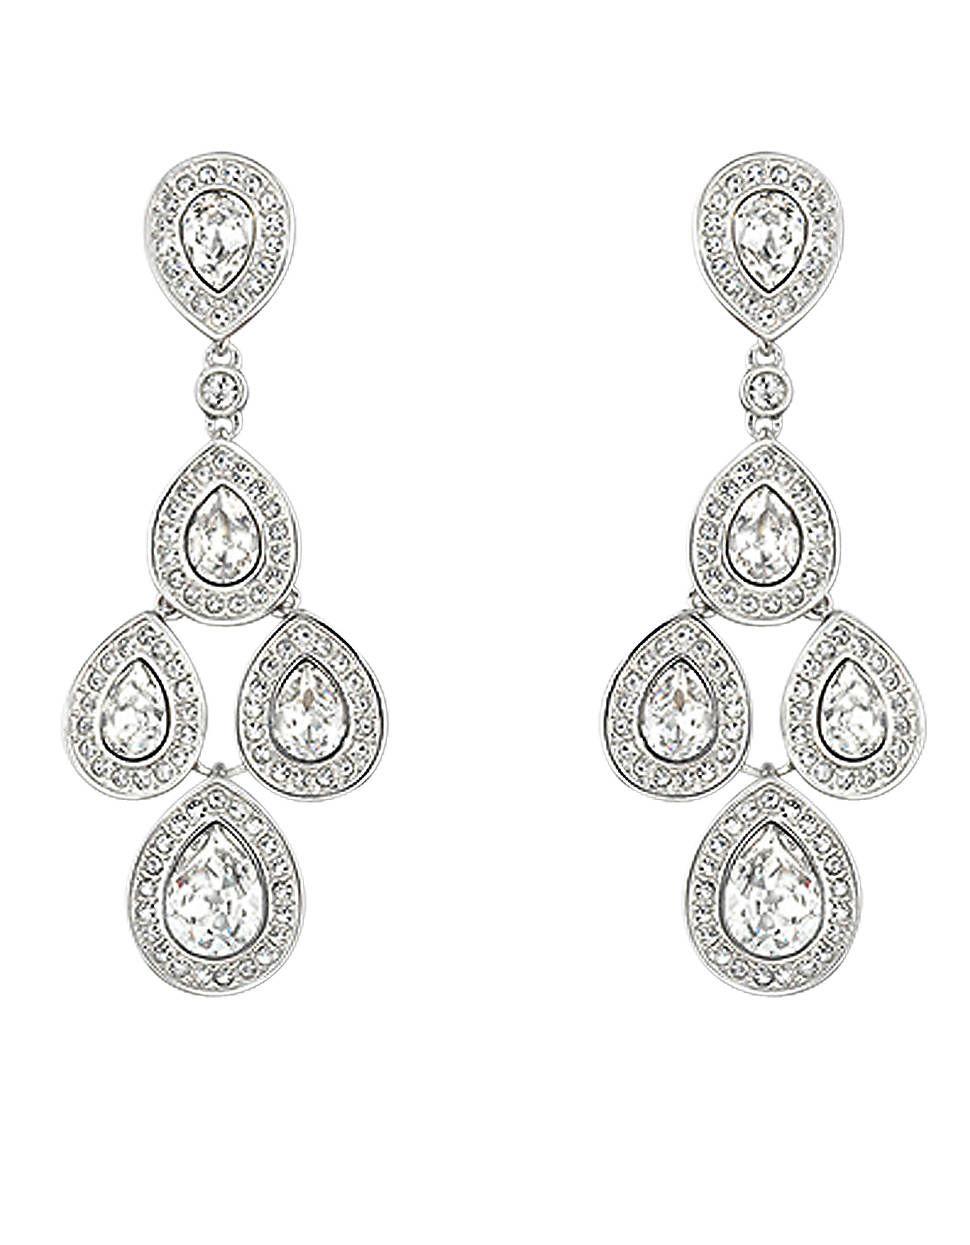 59c526a3c SWAROVSKI Sensation Pierced Earrings | Lord and Taylor | Bridal ...